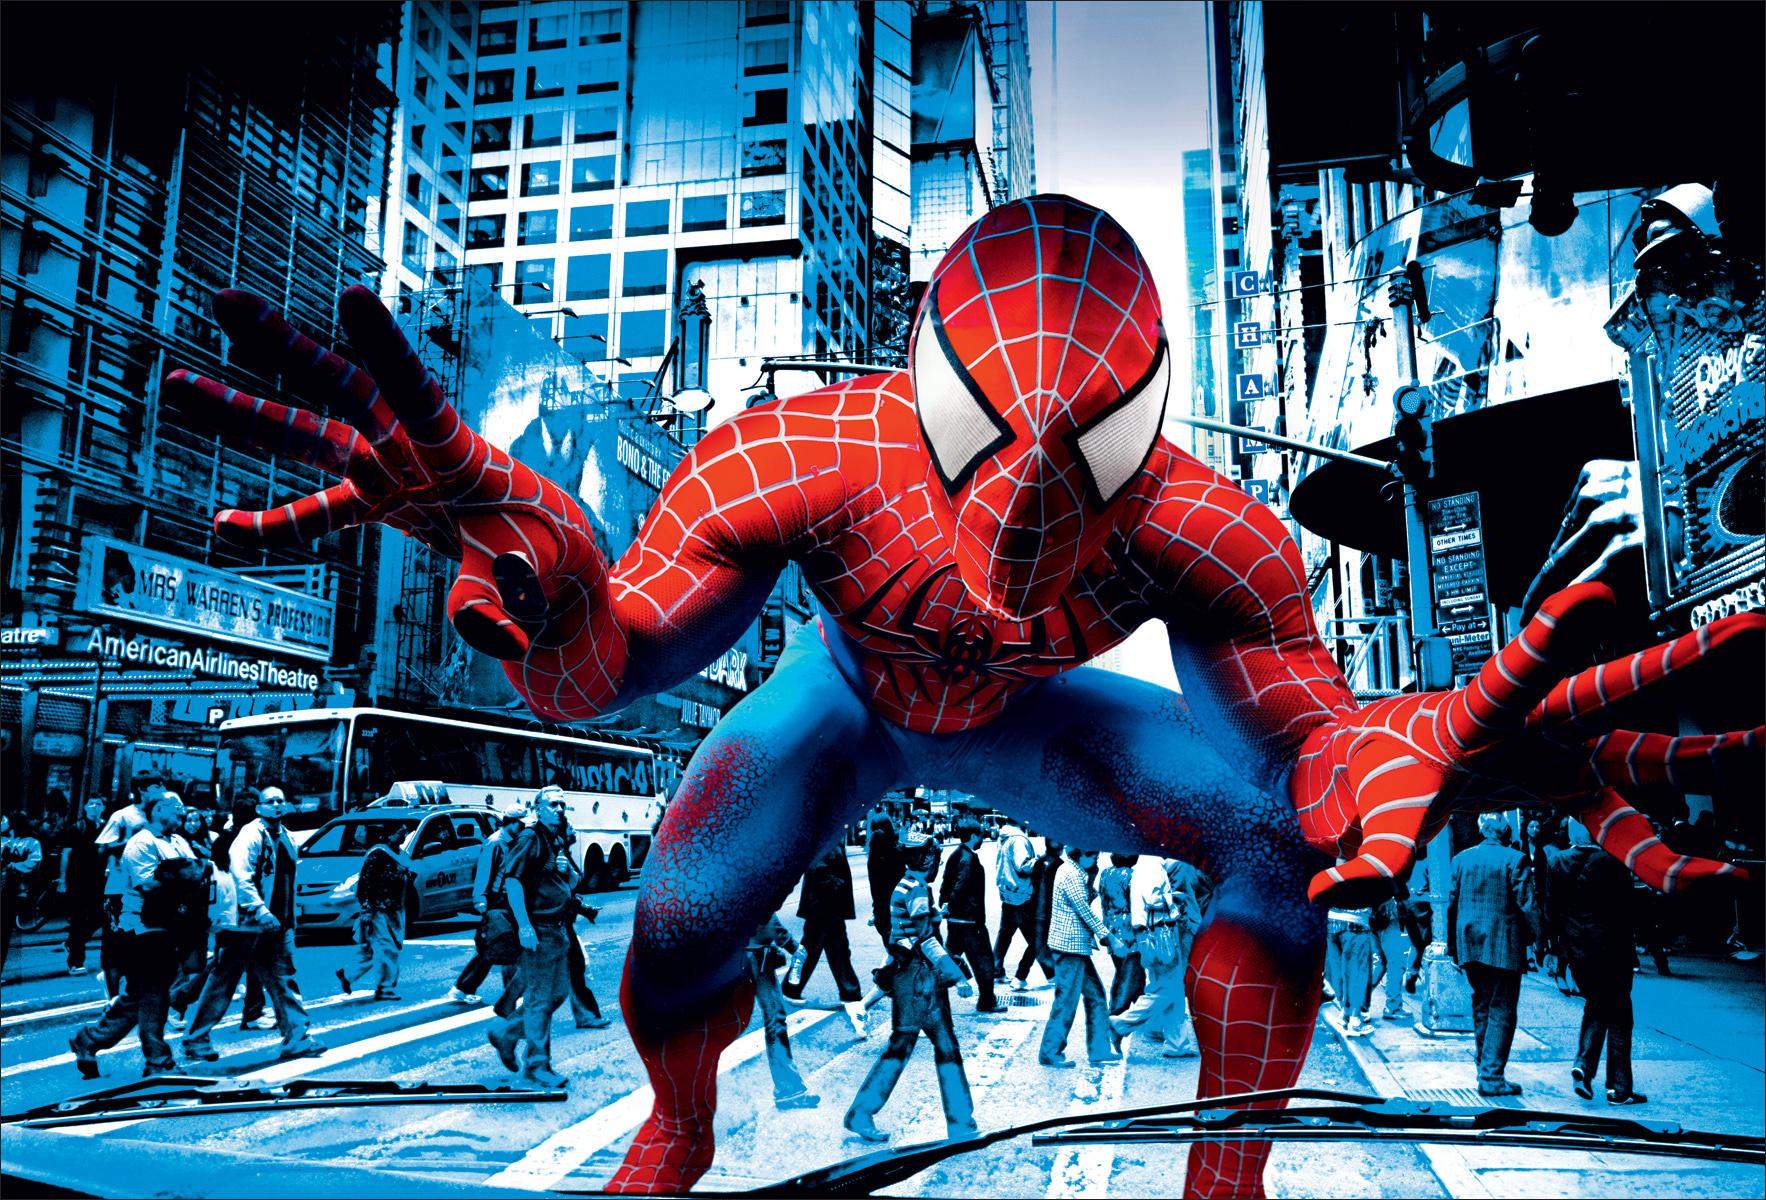 картинки или фото человека паука иногда завидуем